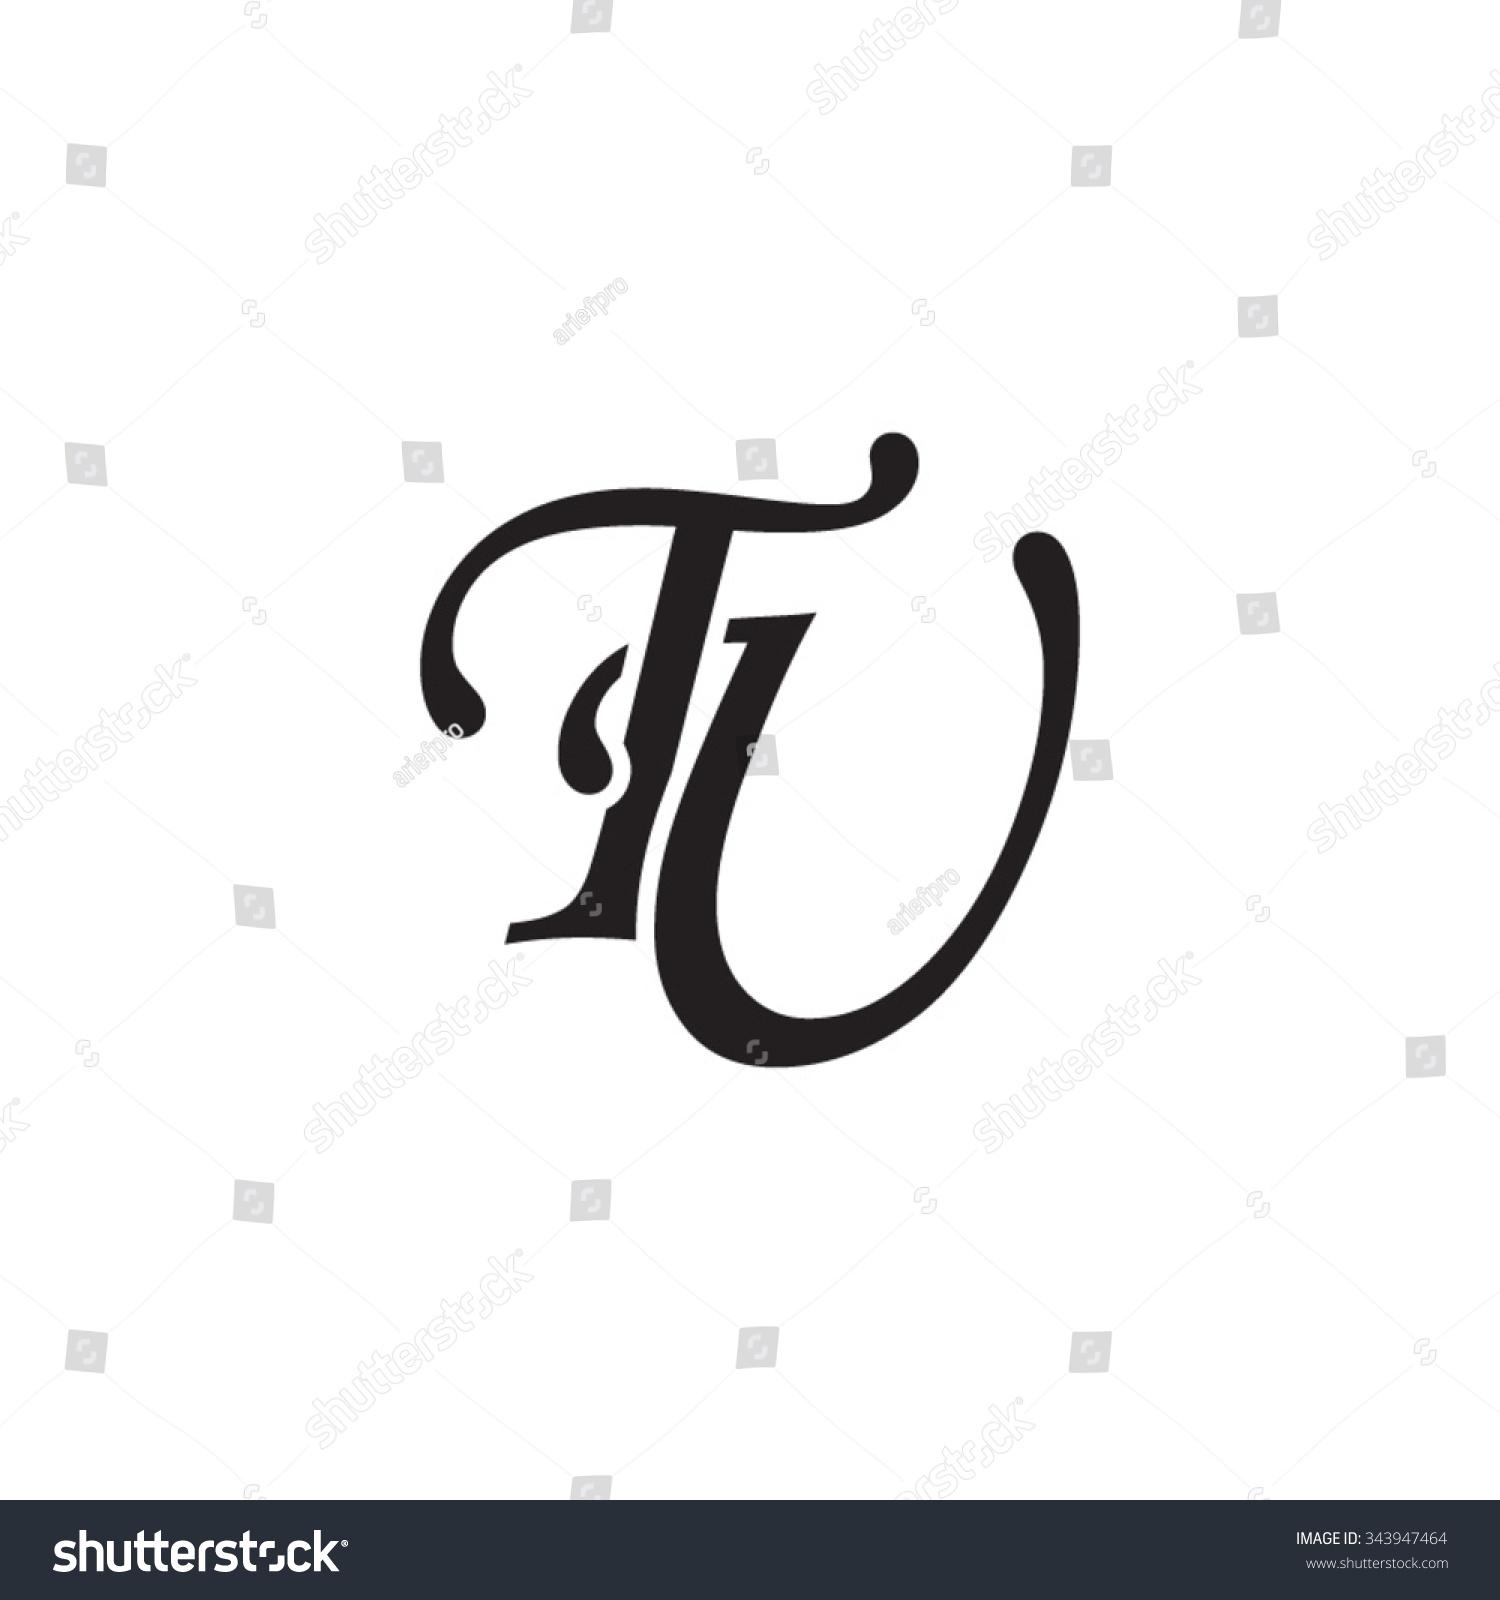 Tj initial luxury ornament monogram logo stock vector - Tu Initial Monogram Logo Stock Vector Illustration 343947464 Shutterstock